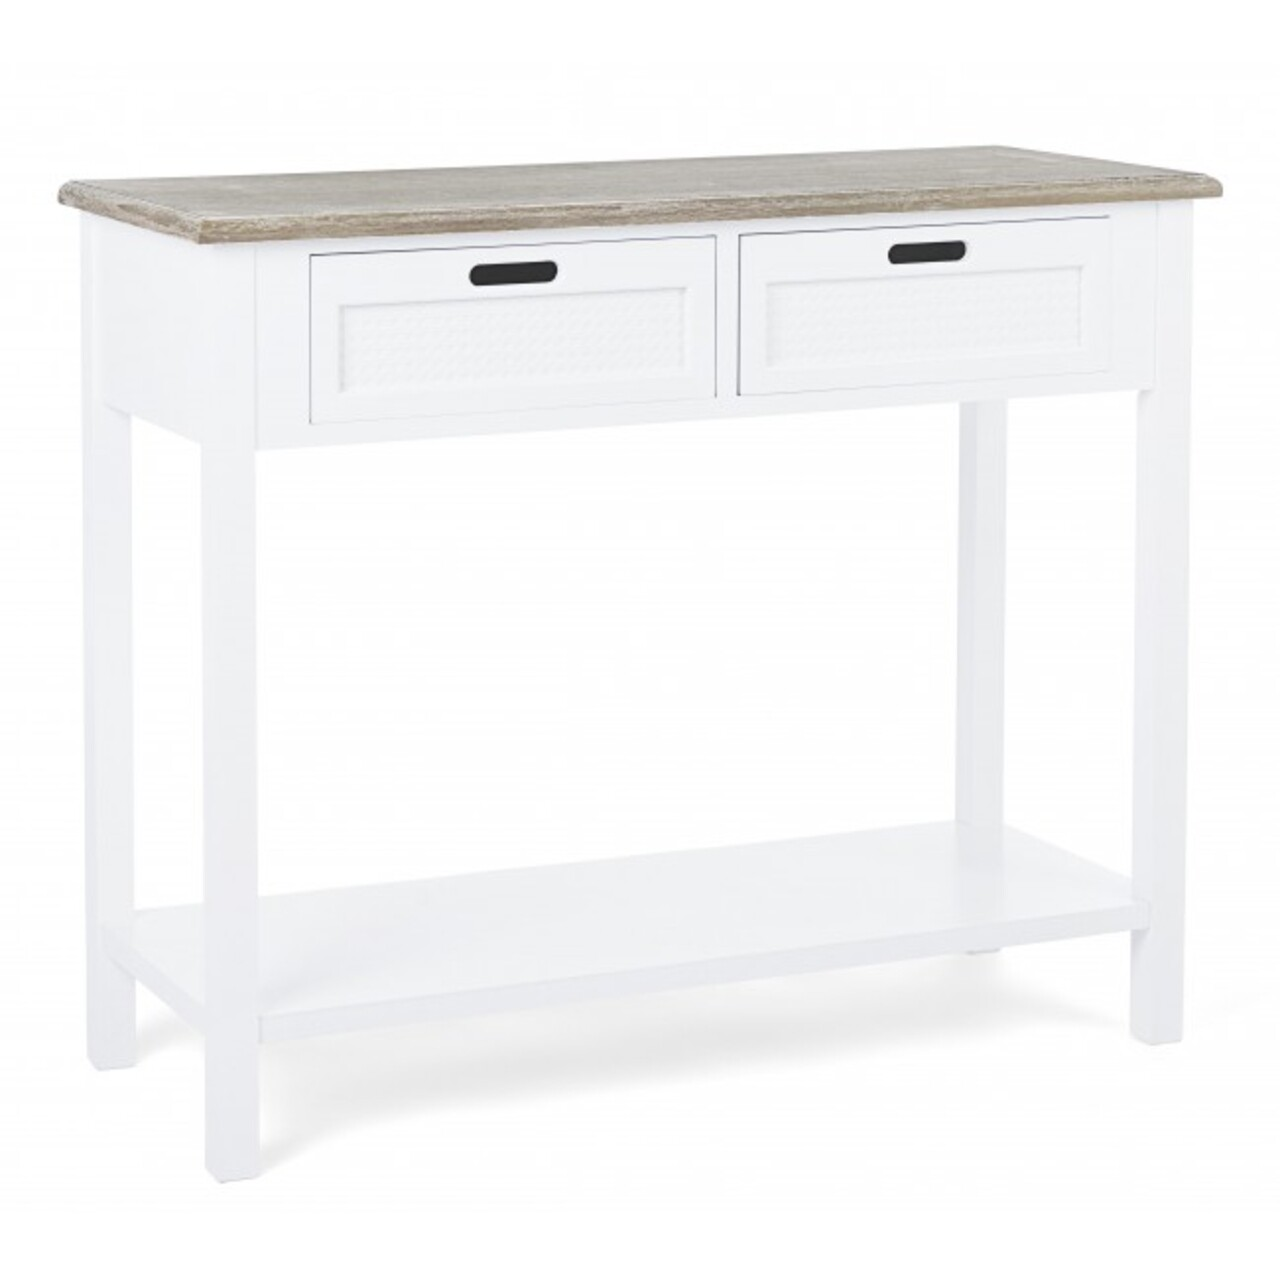 Consola cu 2 sertare, Dorotea, Bizzotto, 100x40x80 cm, lemn de pin/lemn de paulownia